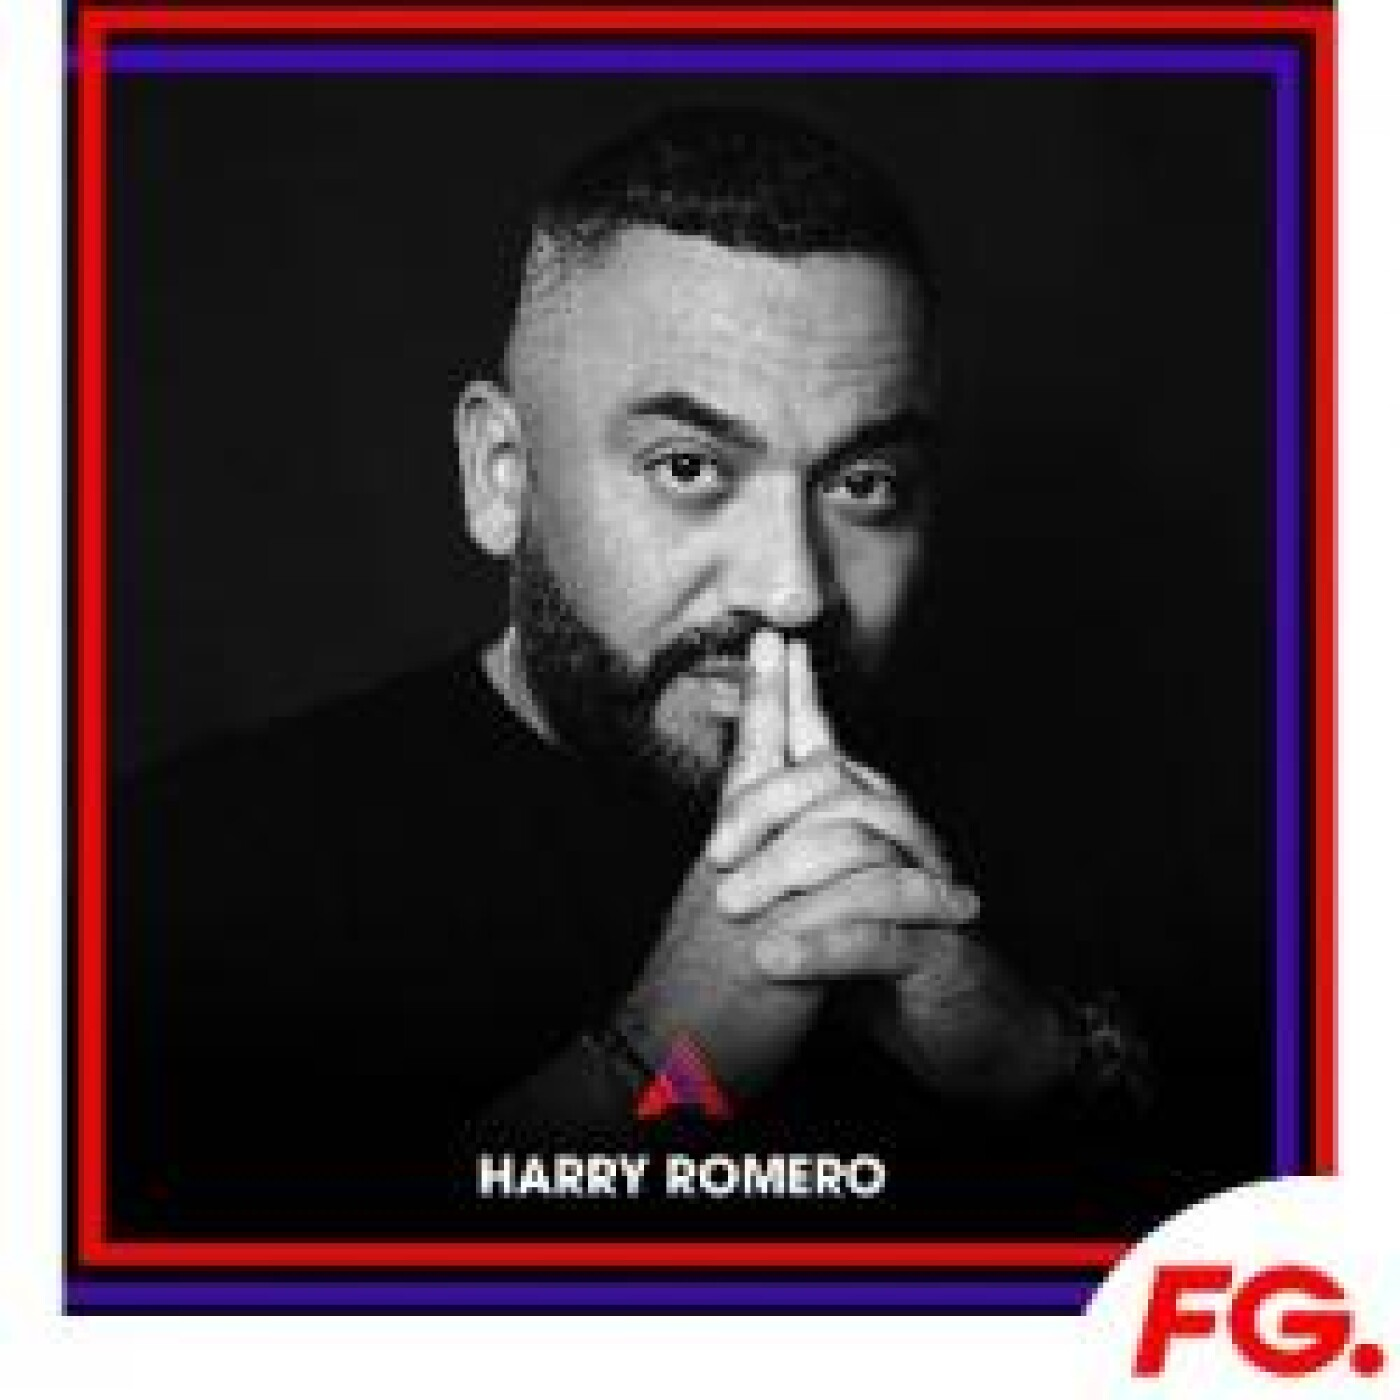 CLUB FG : HARRY ROMERO